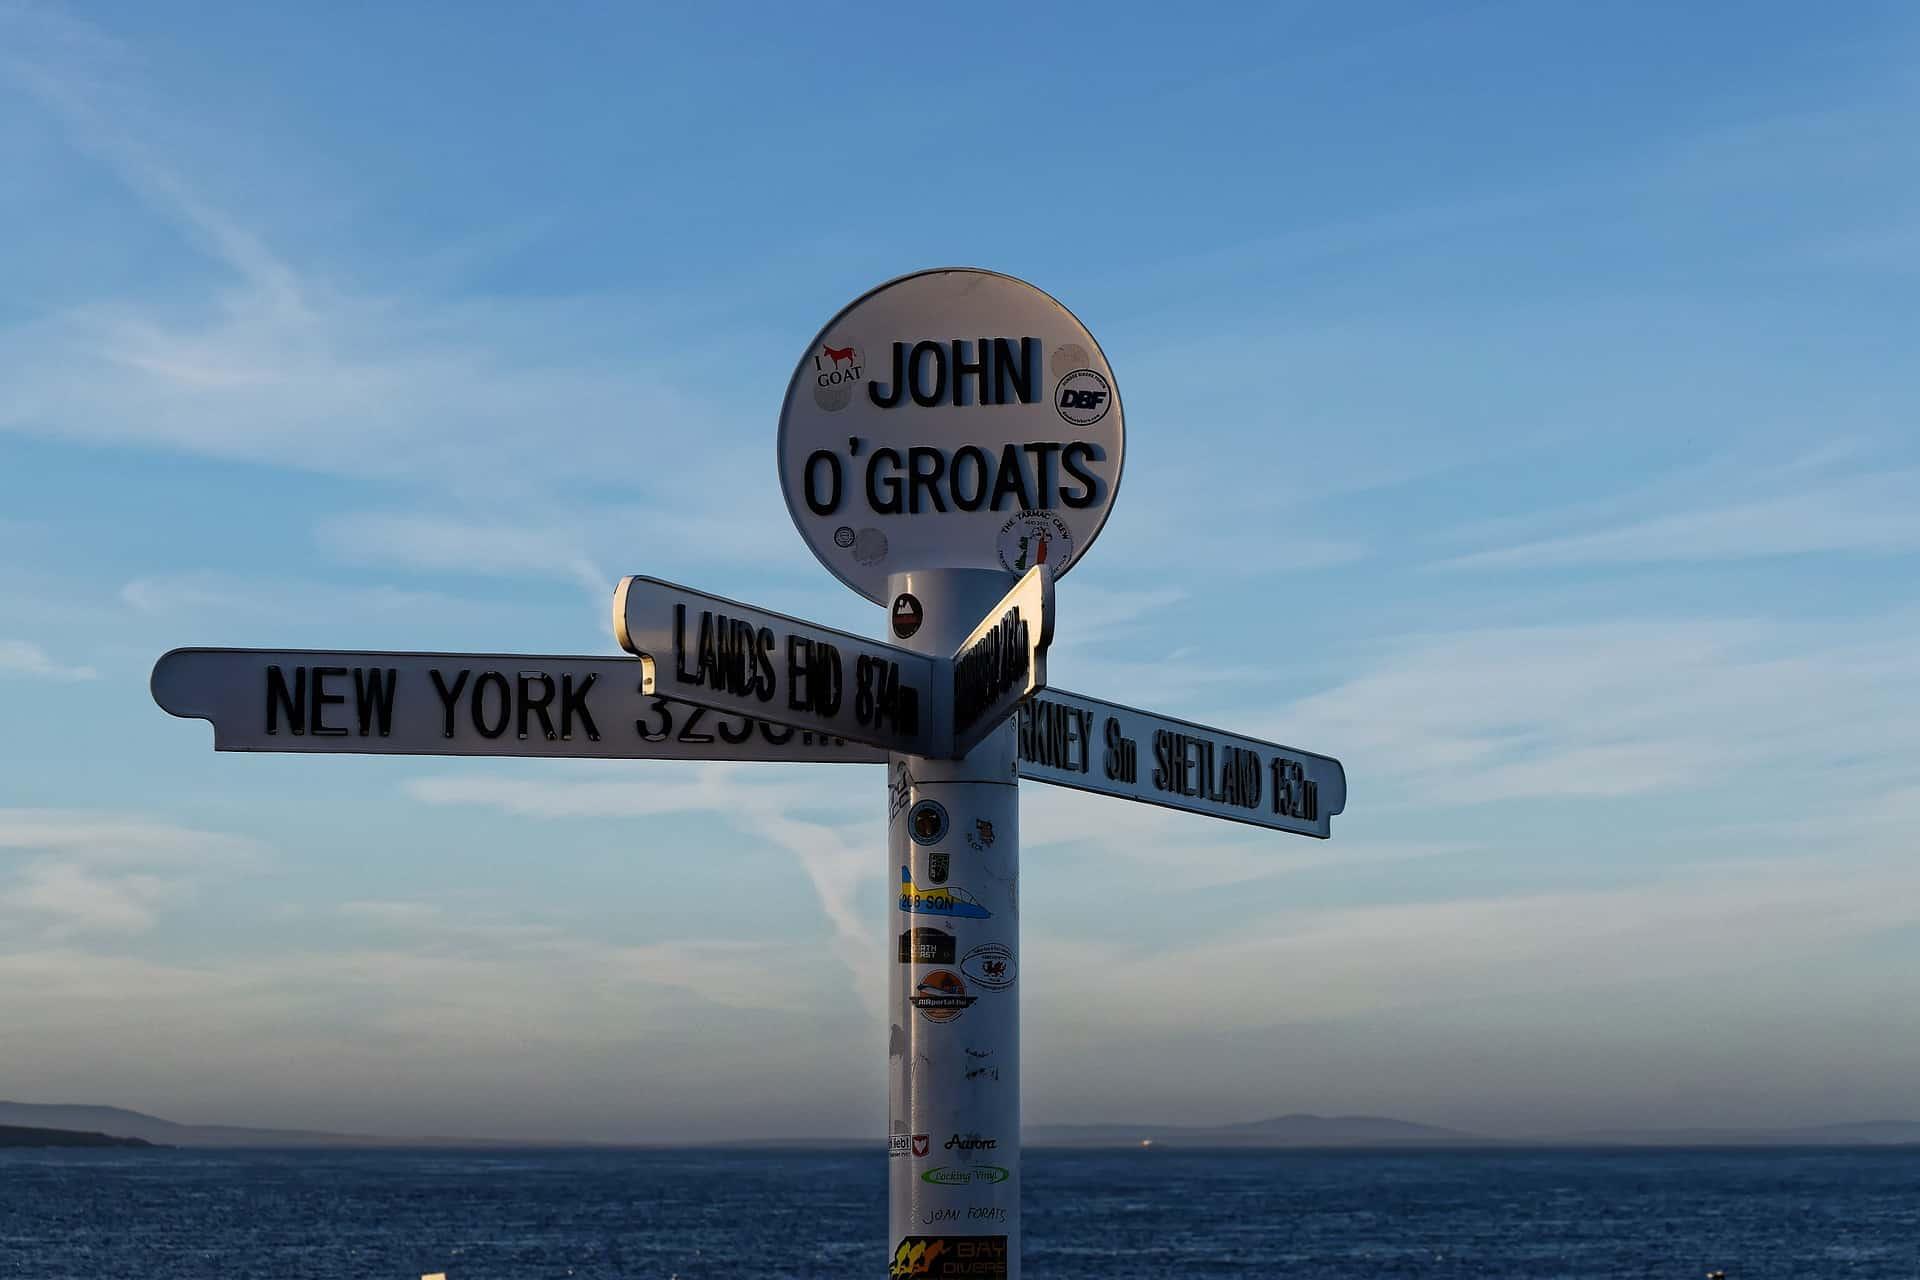 john-ogroats